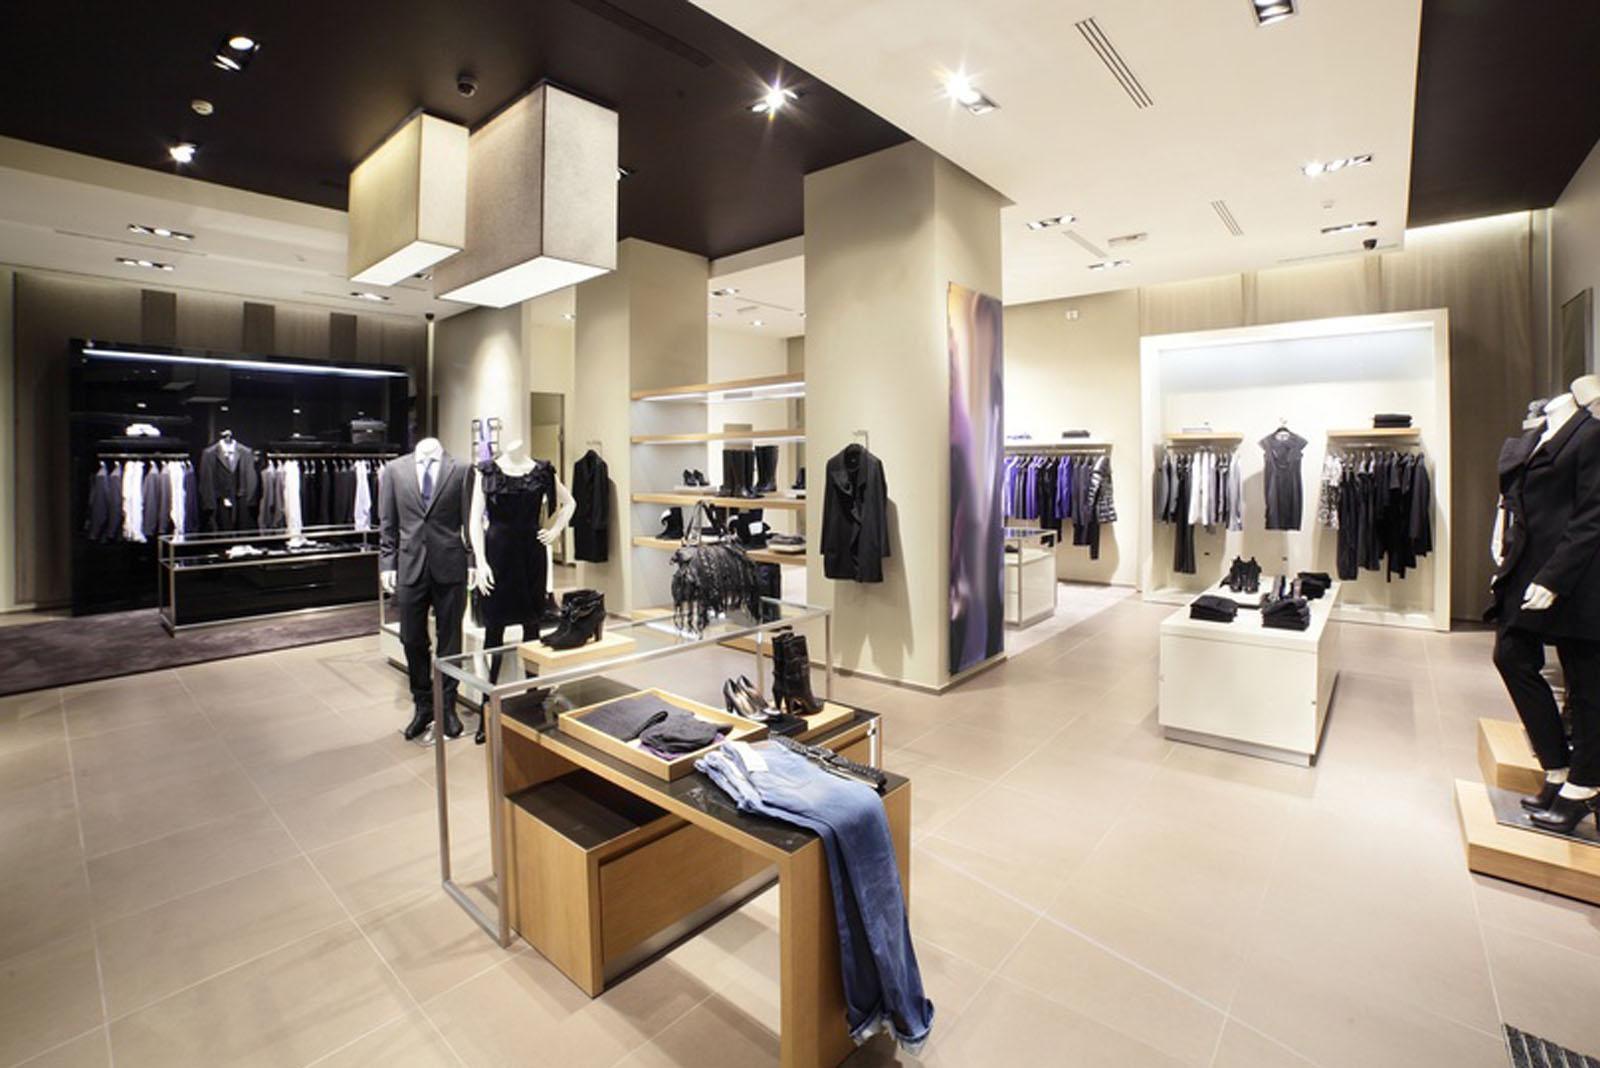 Showroom design Kincir Bali WP 1